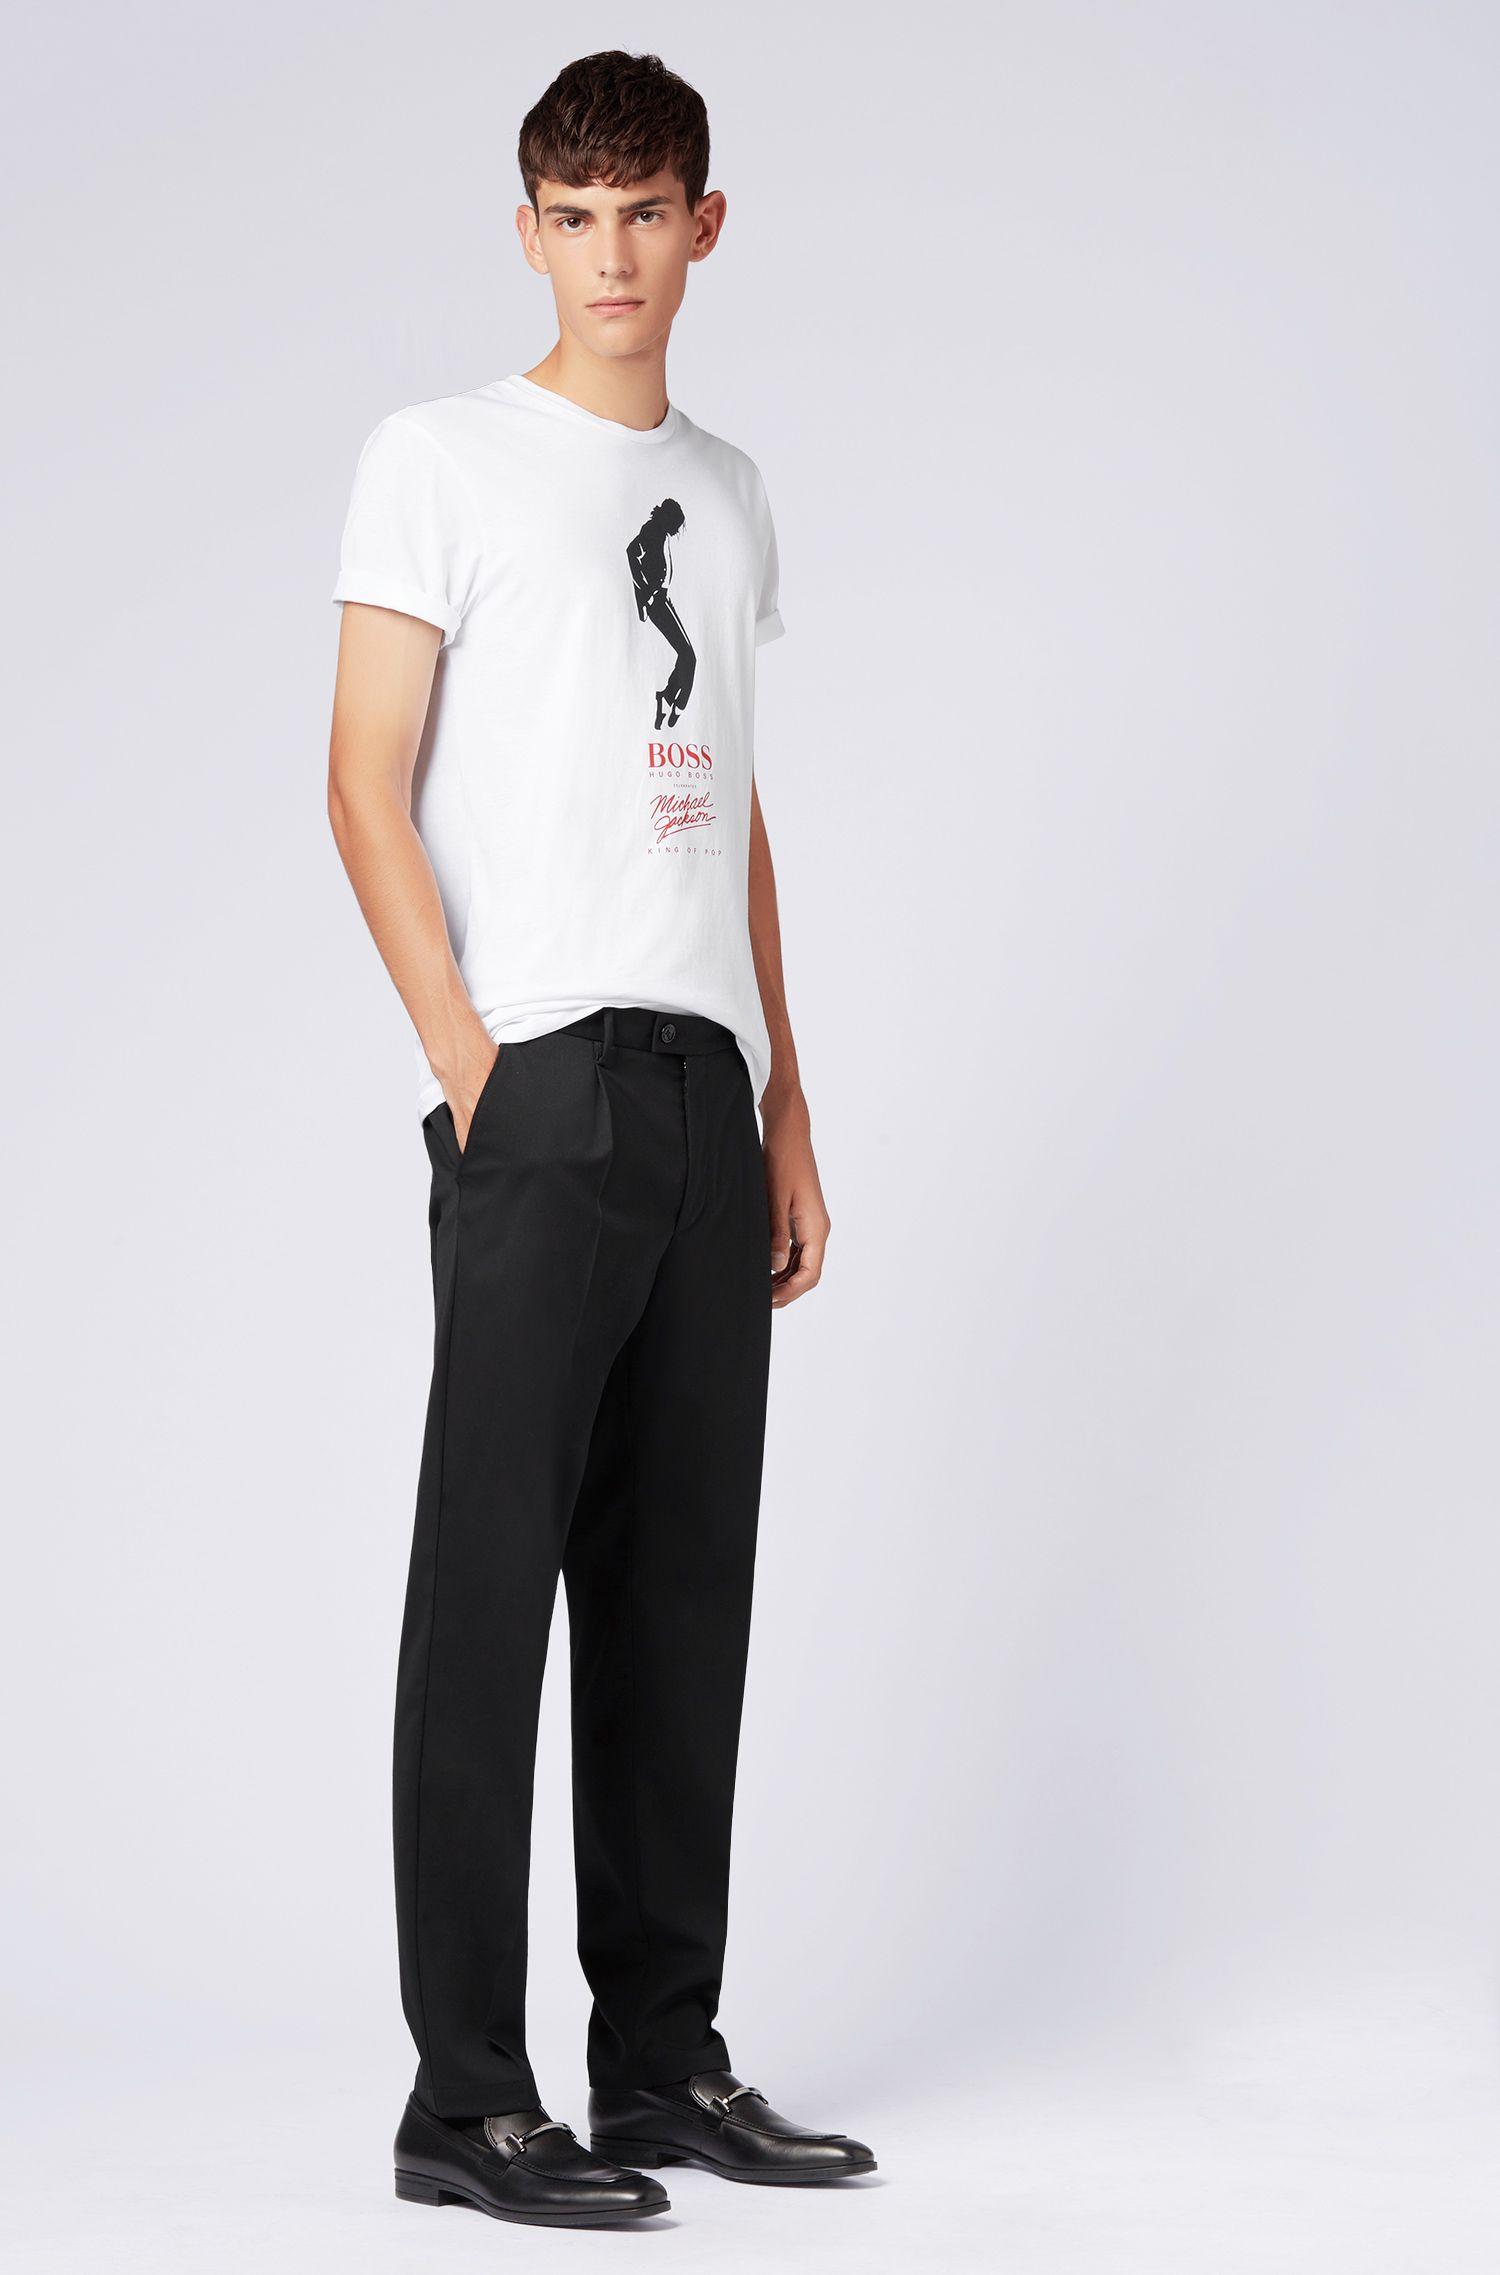 Uniseks T-shirt van katoen met print met Michael Jackson-danspose, Wit